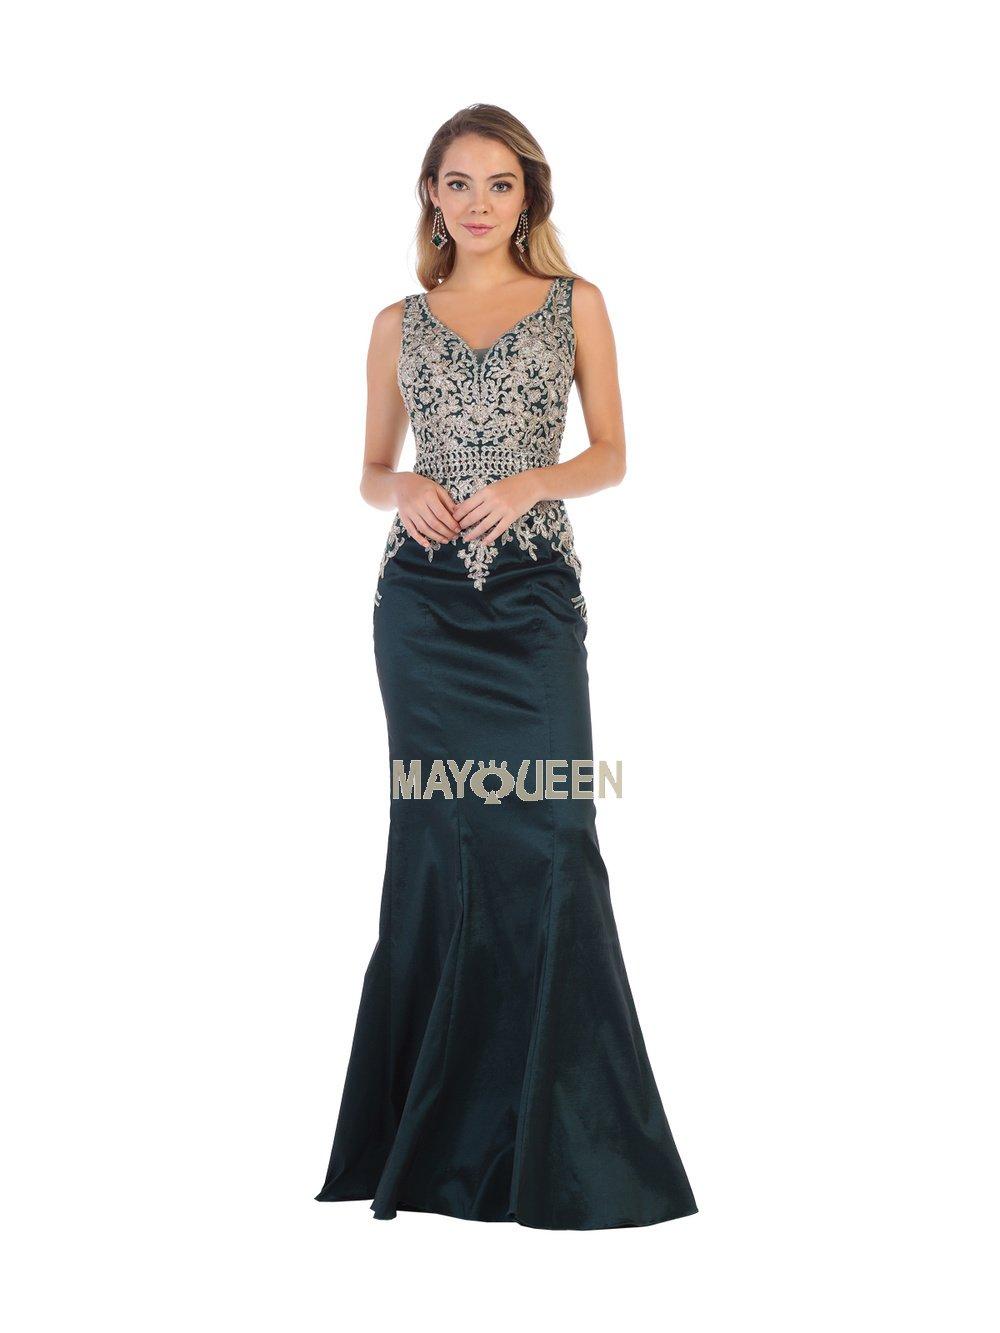 8f1723c5f7ff MQ 1608 - Beaded Lace Tank Mermaid with Taffeta Skirt | Diggz Prom |  Pinterest | Taffeta skirt, Lace tank and Beaded lace